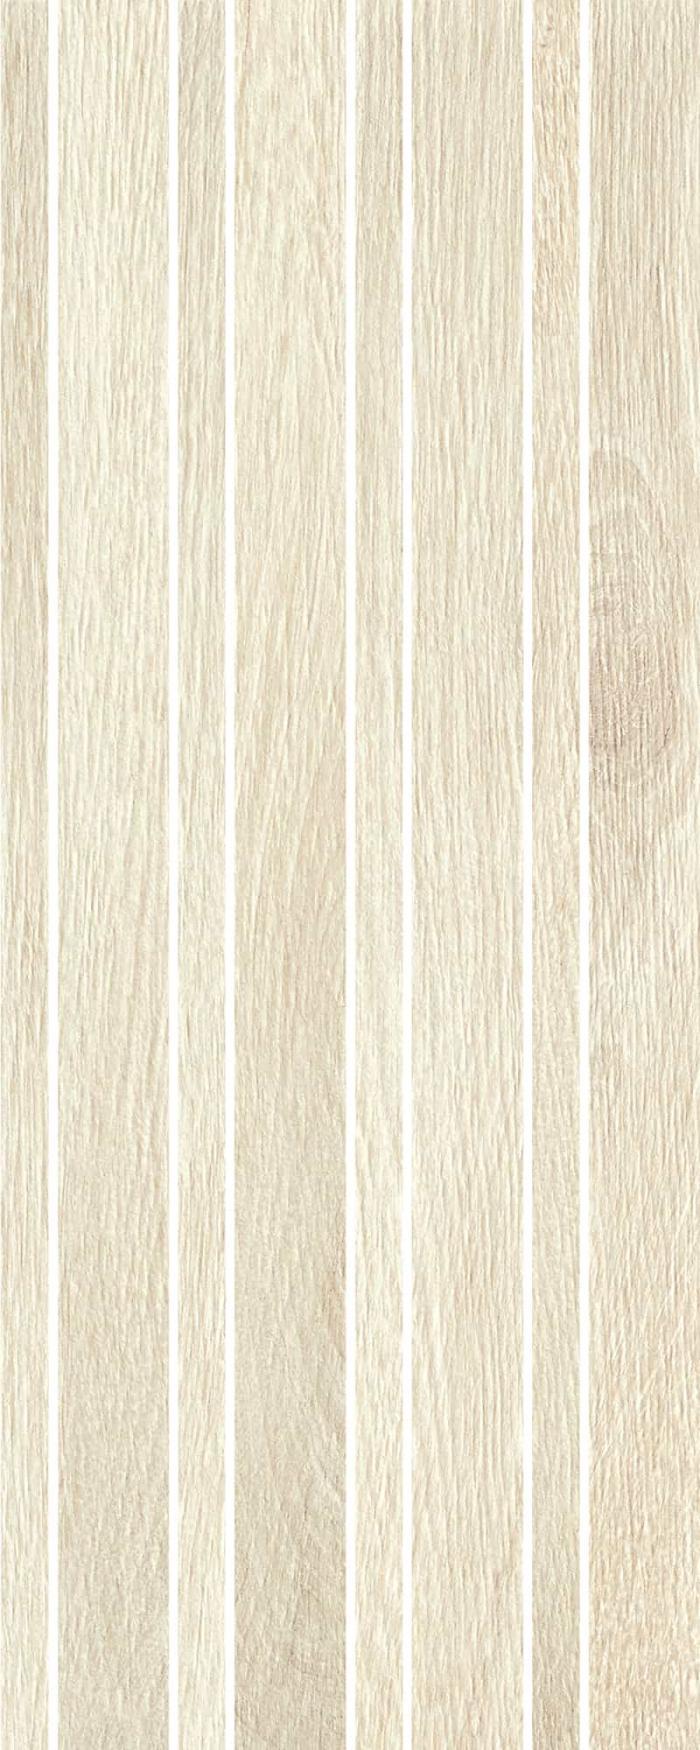 Mosaic Timber Raw White AS